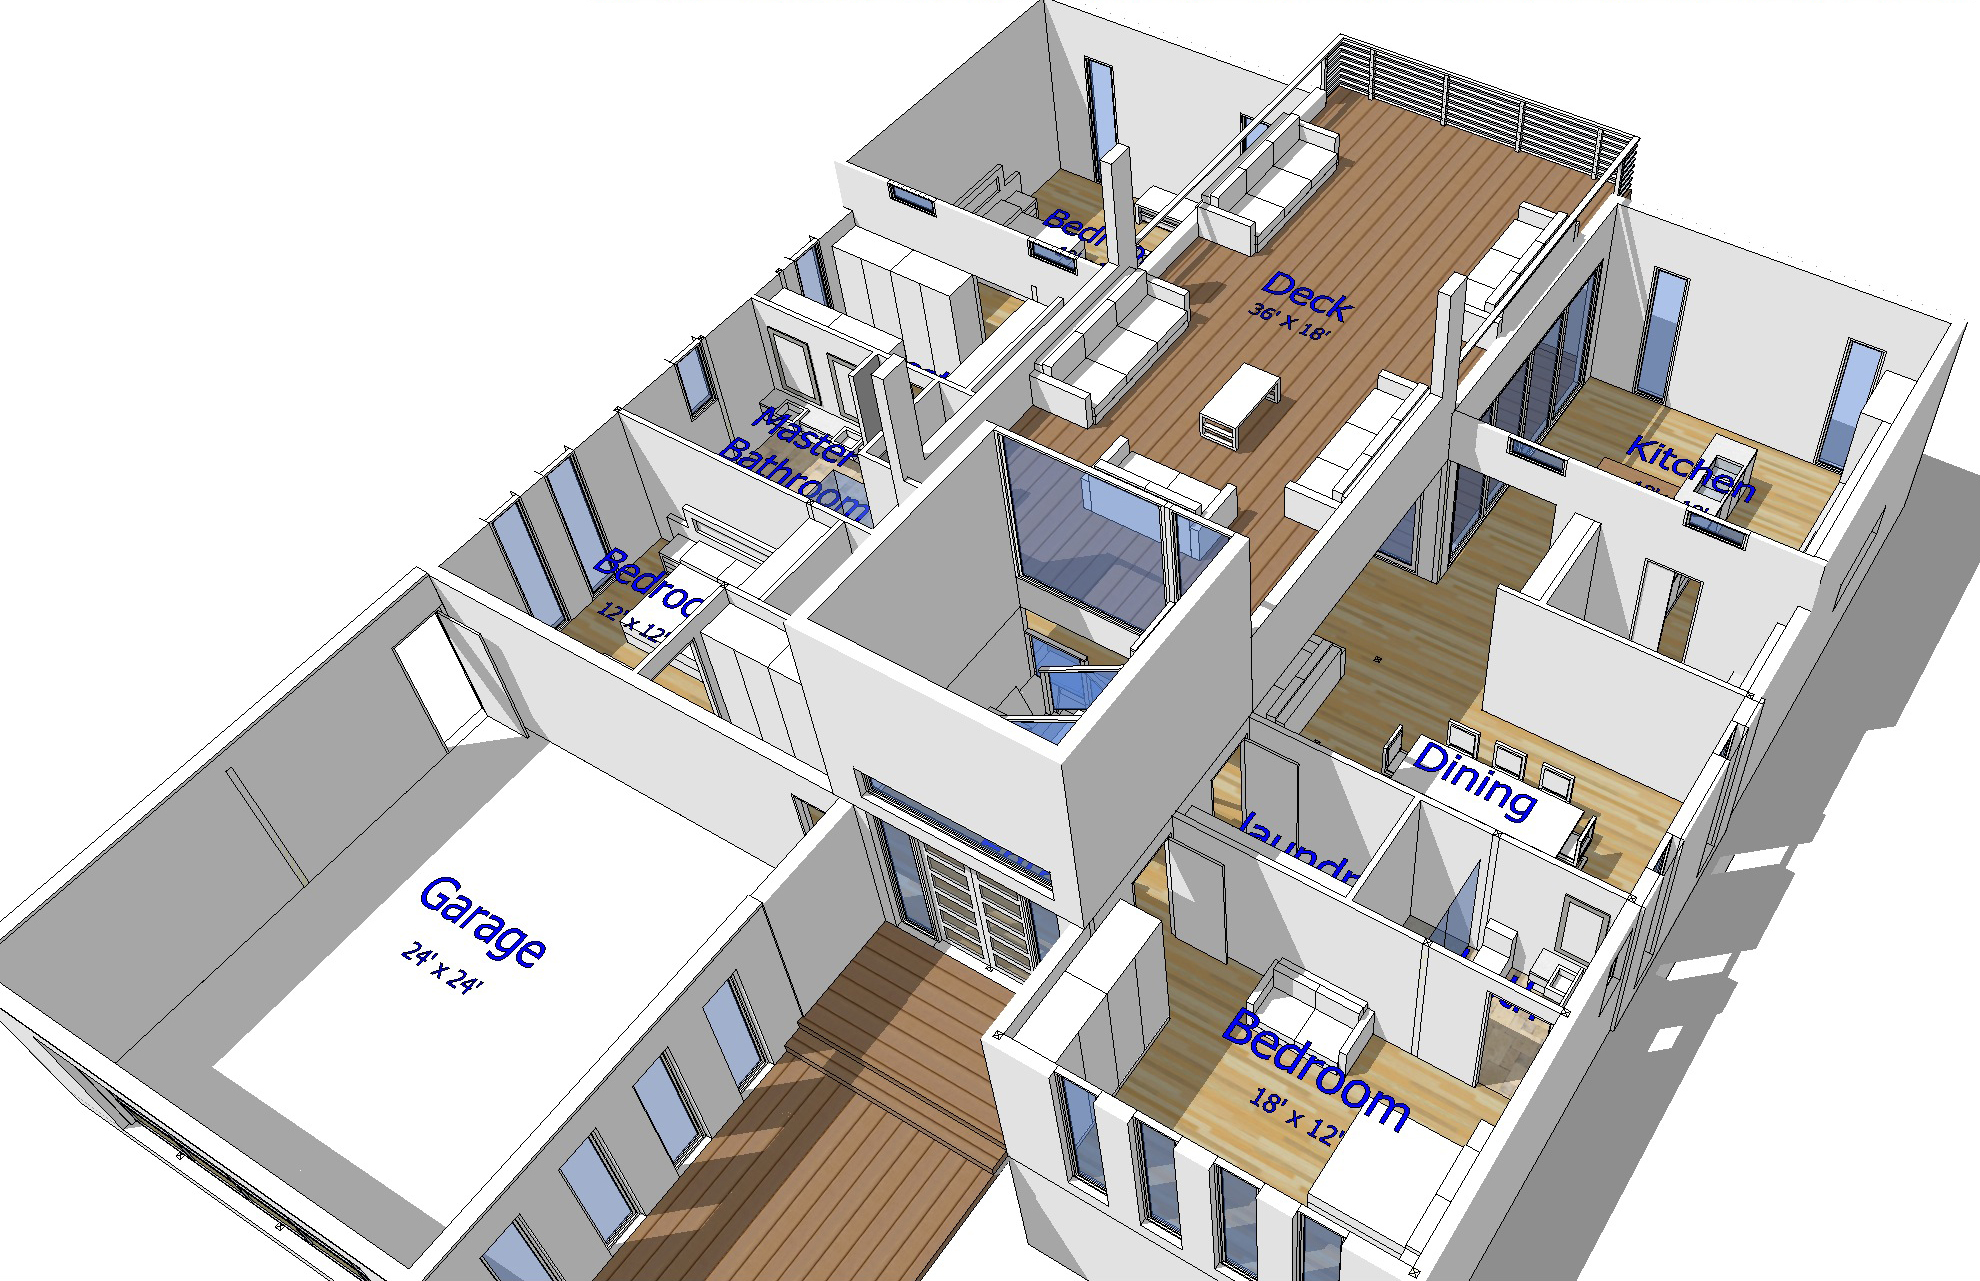 BUY Our 2 Level Steel Frame Home 3D Floor Plan - Next Gen ... Steel Frame Homes Near Me